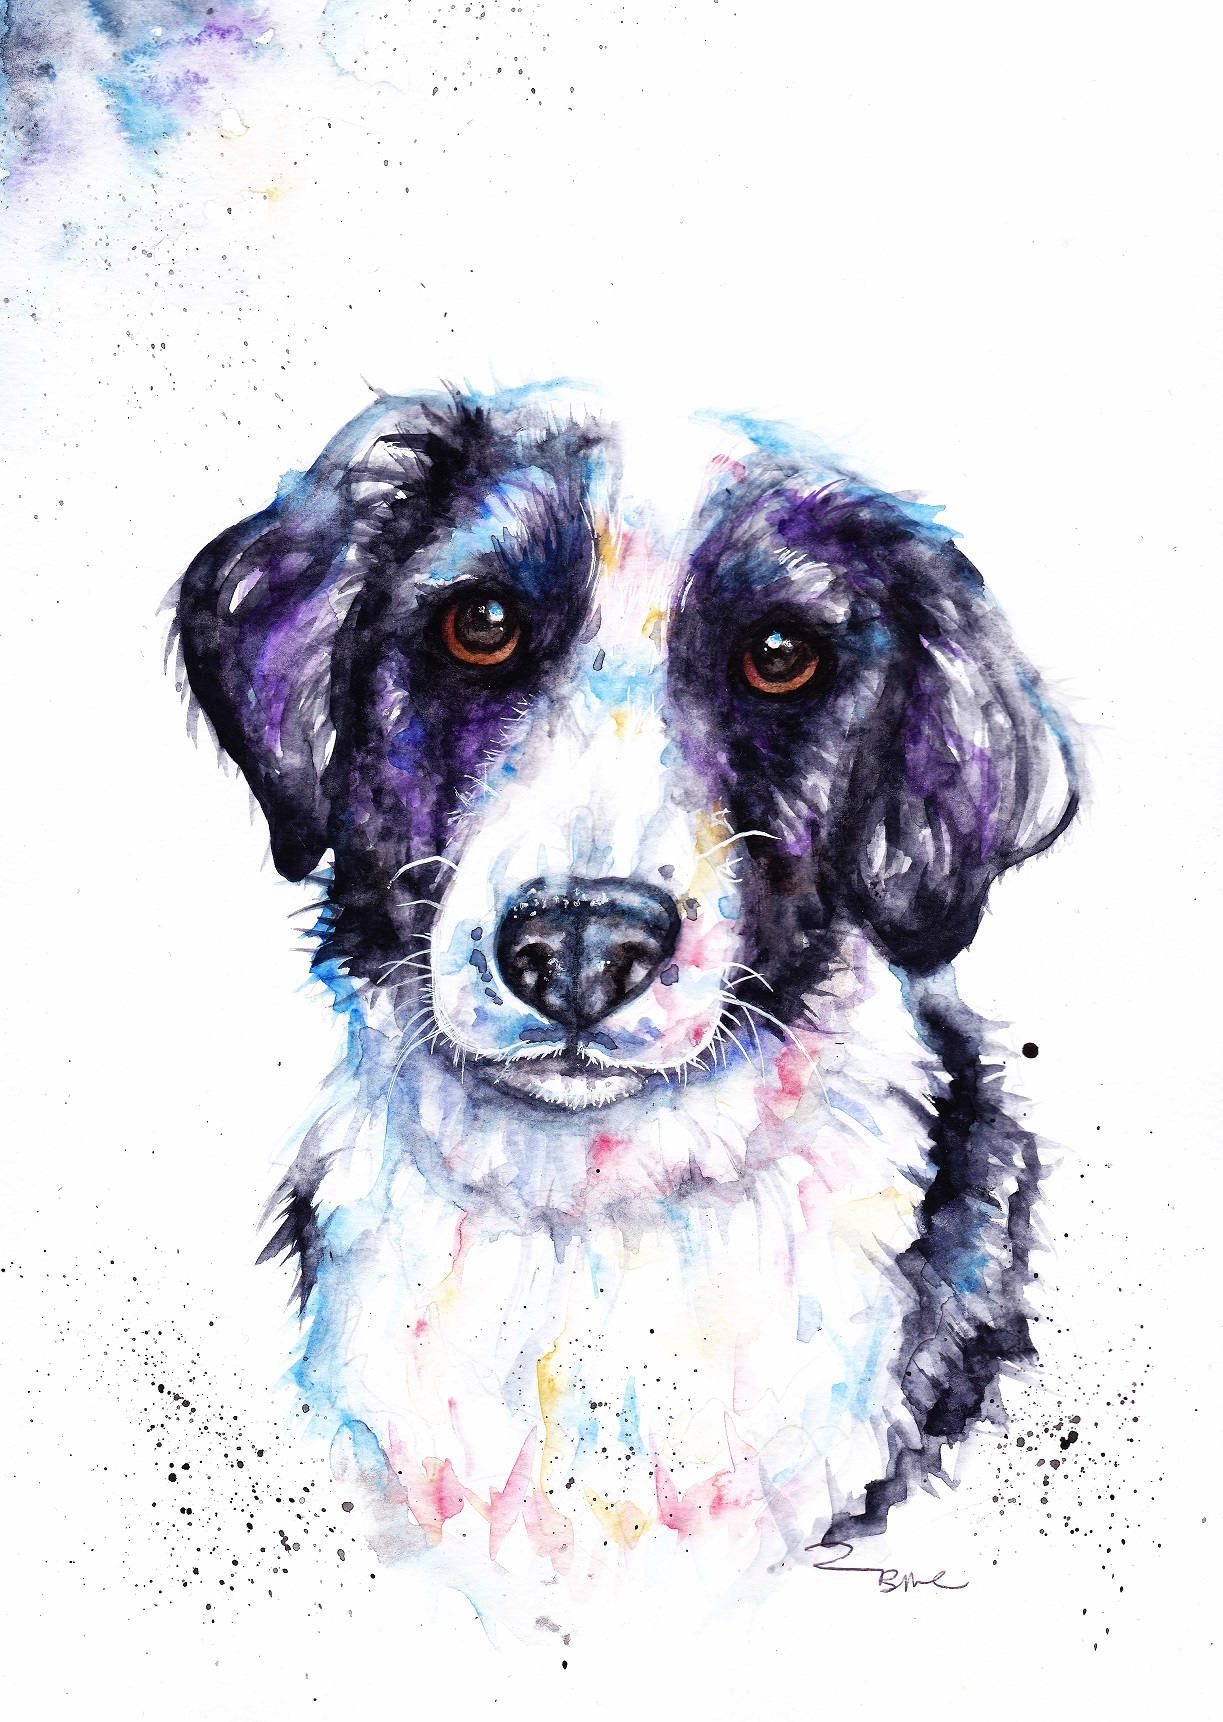 dbfc8b42c5b2 Love to do pet commisions #dog,#cat#christmas,#horse,#guinea_pig,#birds,#family,#present,#artwork#watercolour,#art,commision  www.etsy.com/uk/shop/BebesArts